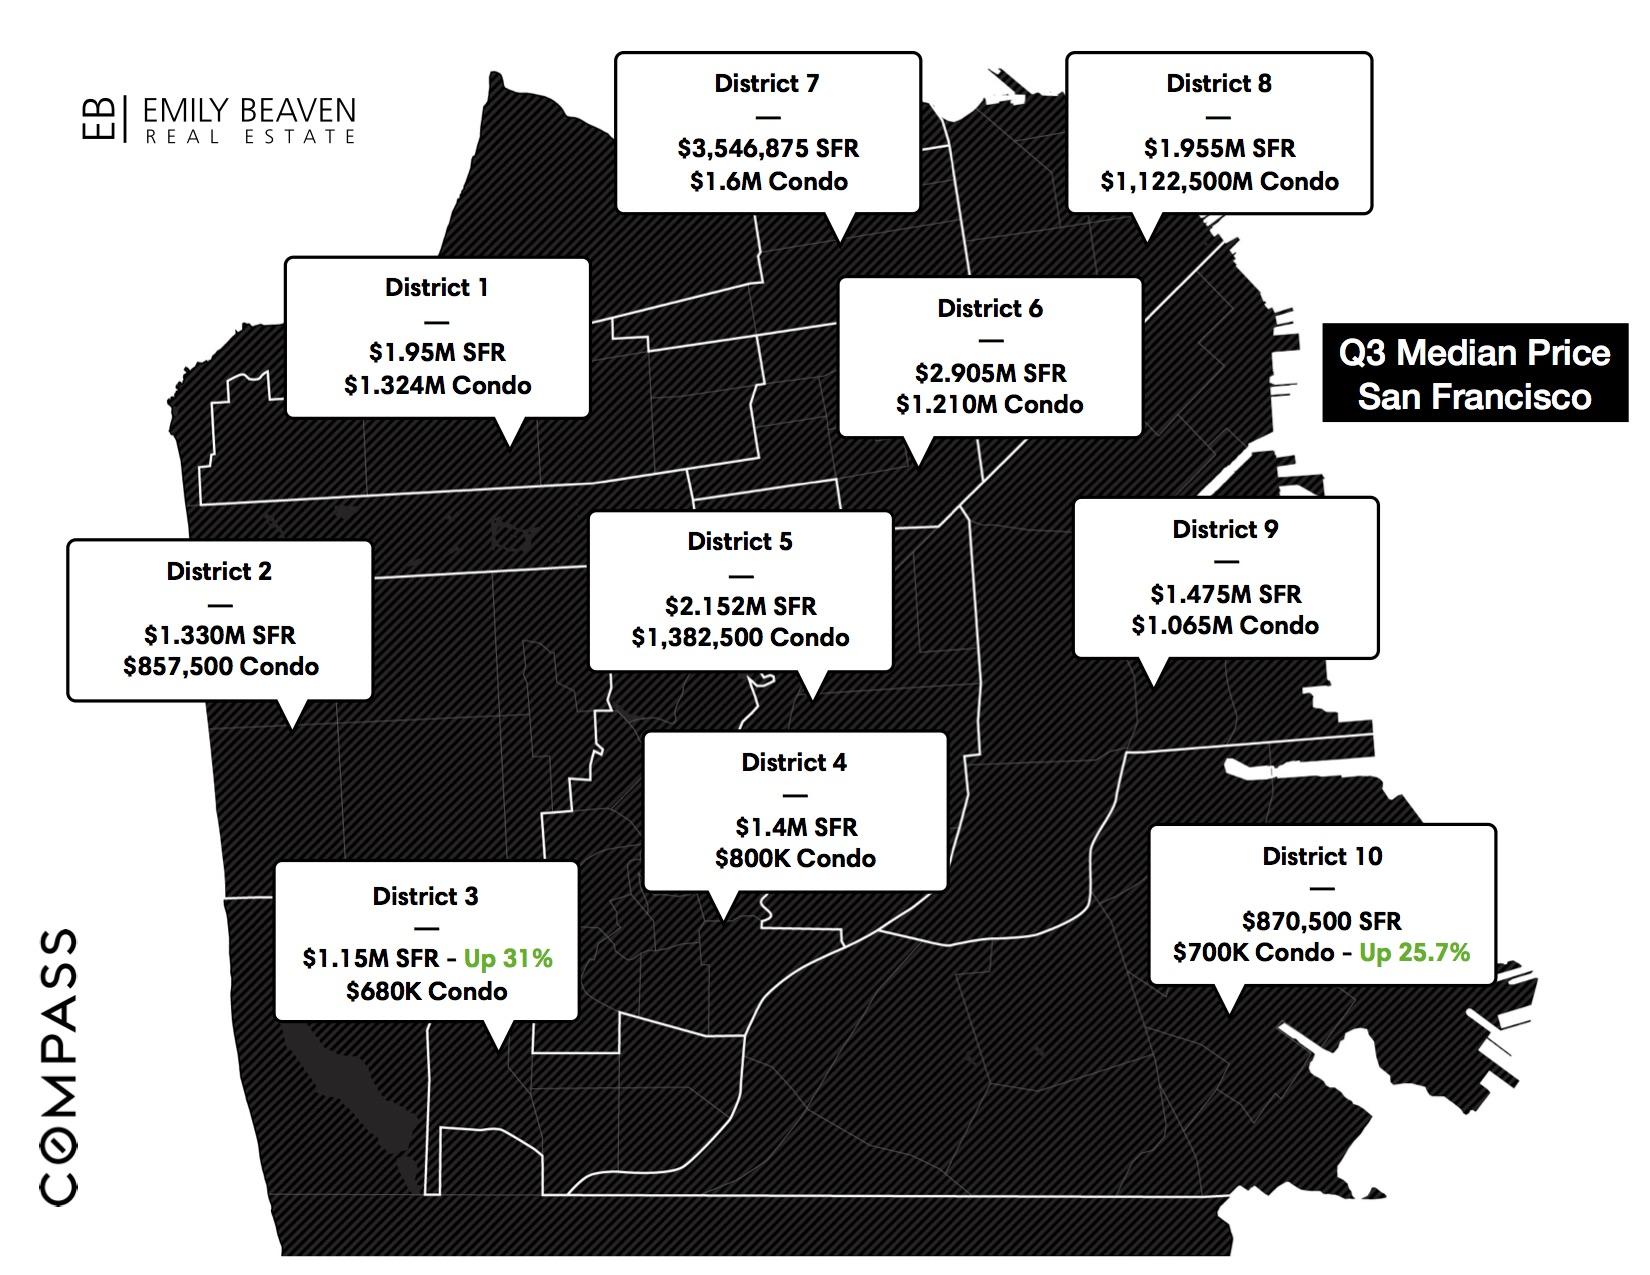 Emily Beaven San Francisco Real Estate Market Update Q3 2017